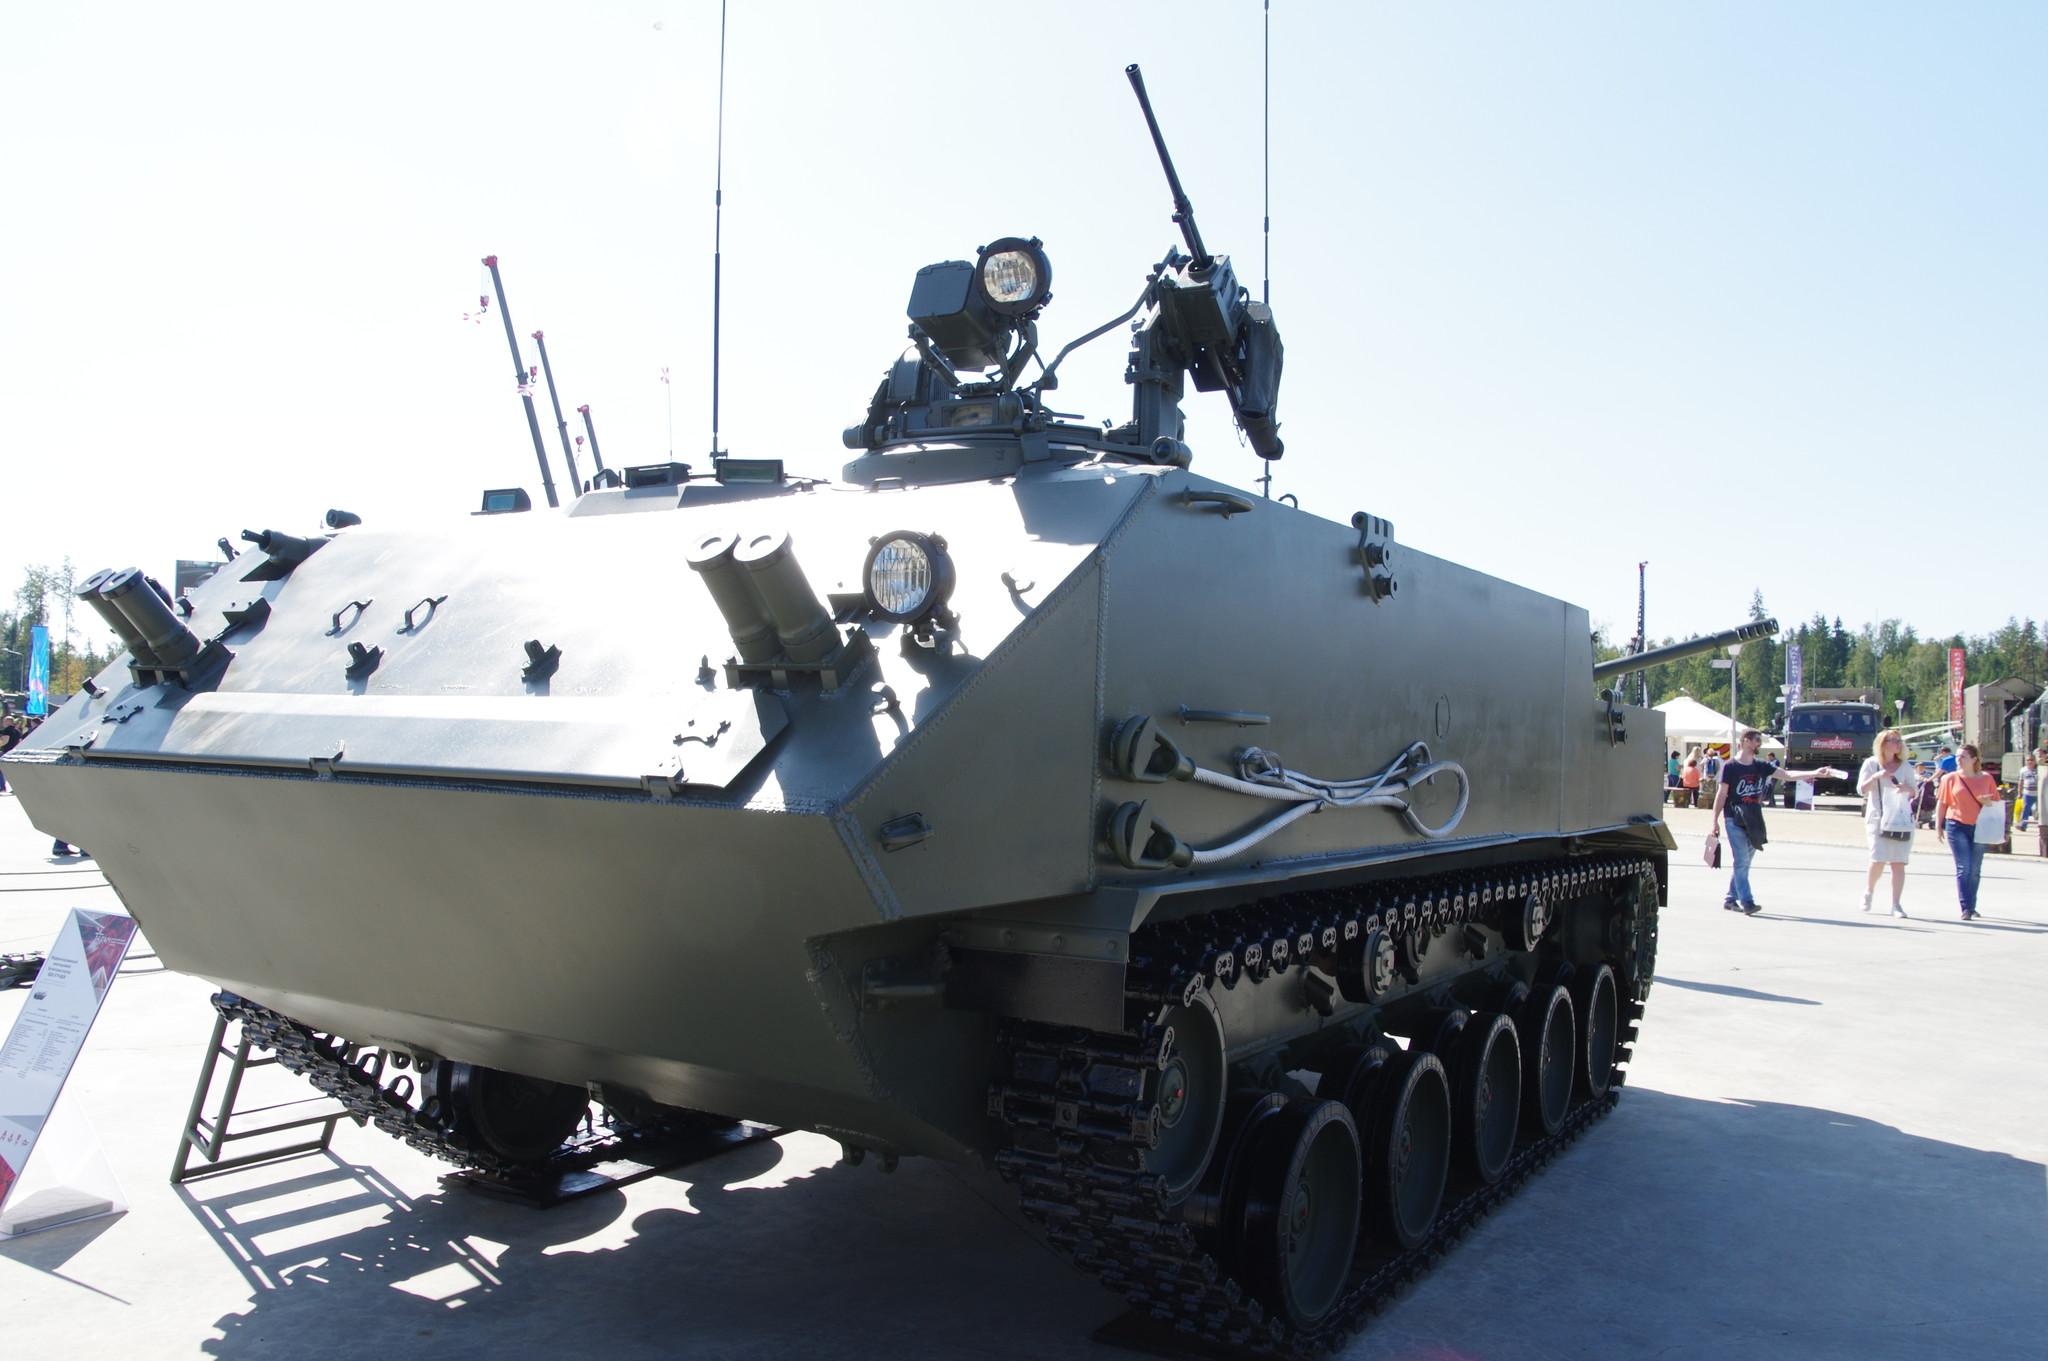 Модернизированный многоцелевой бронетранспортёр ВДВ БТР-МДМ